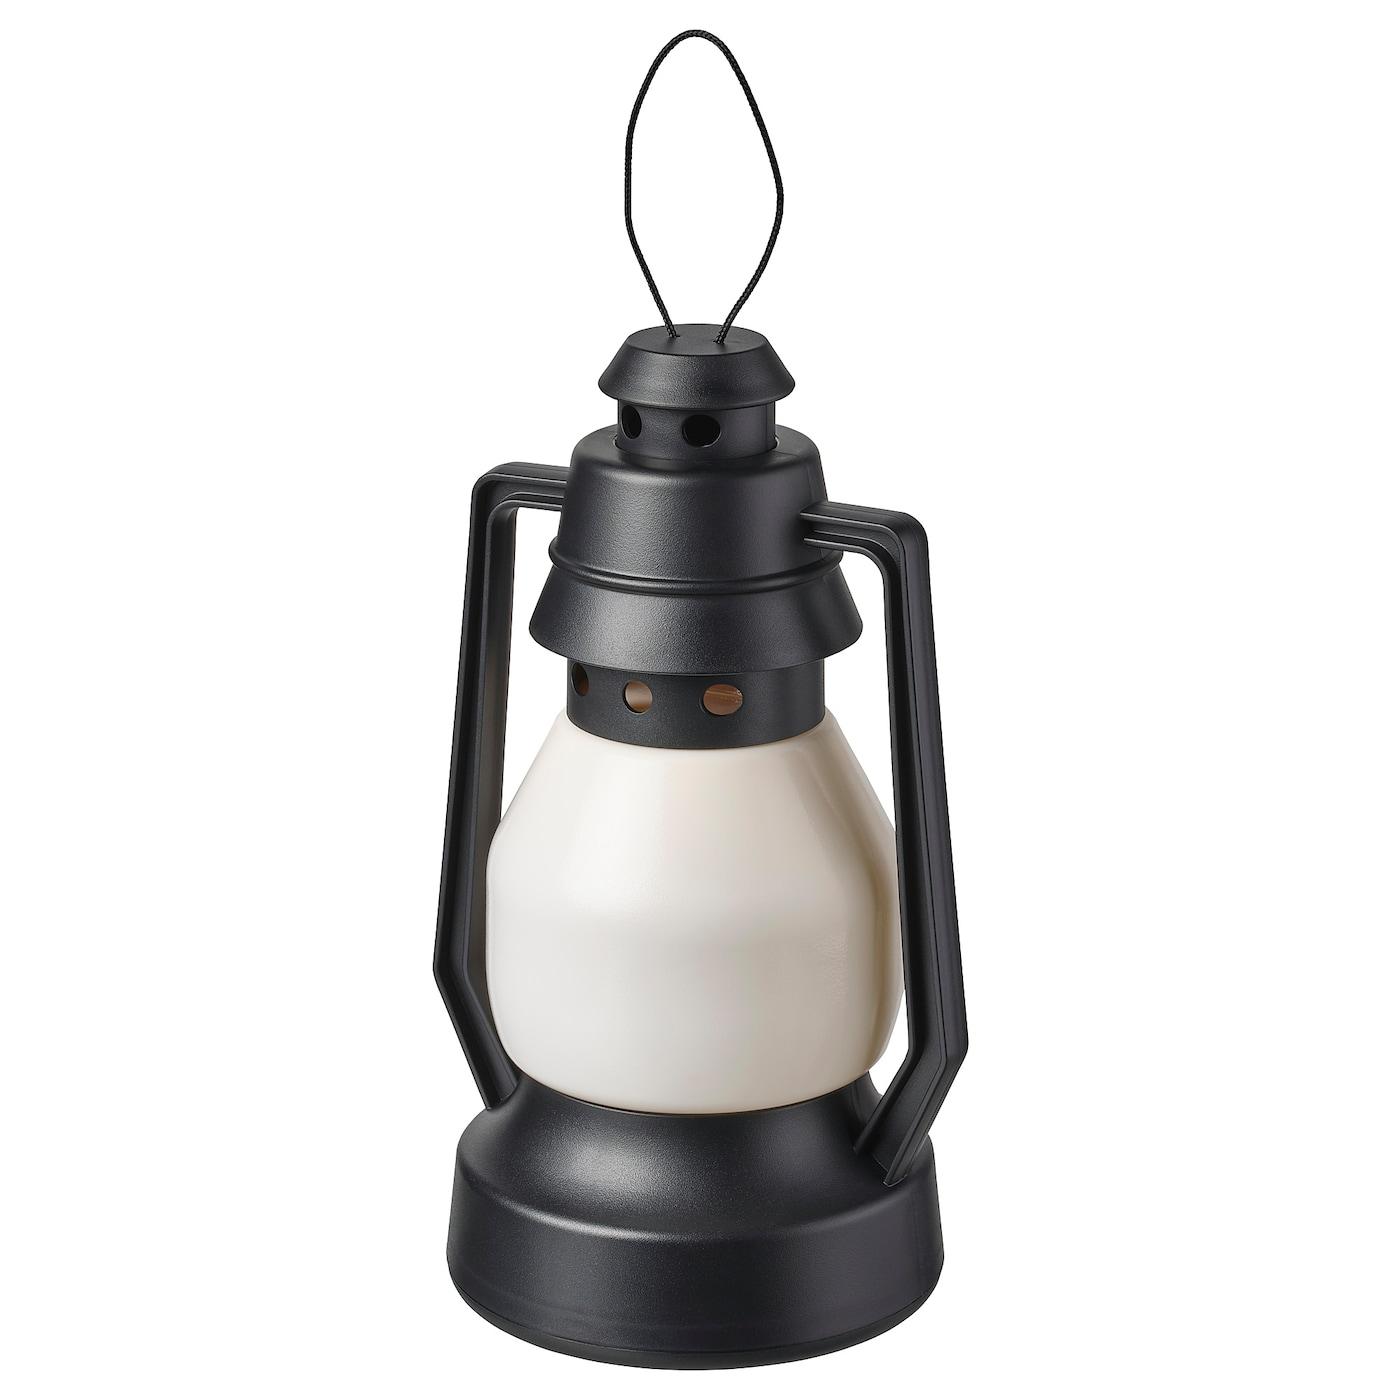 Led Decorative Light Vinterfest Battery Operated Indoor Outdoor Lantern Black